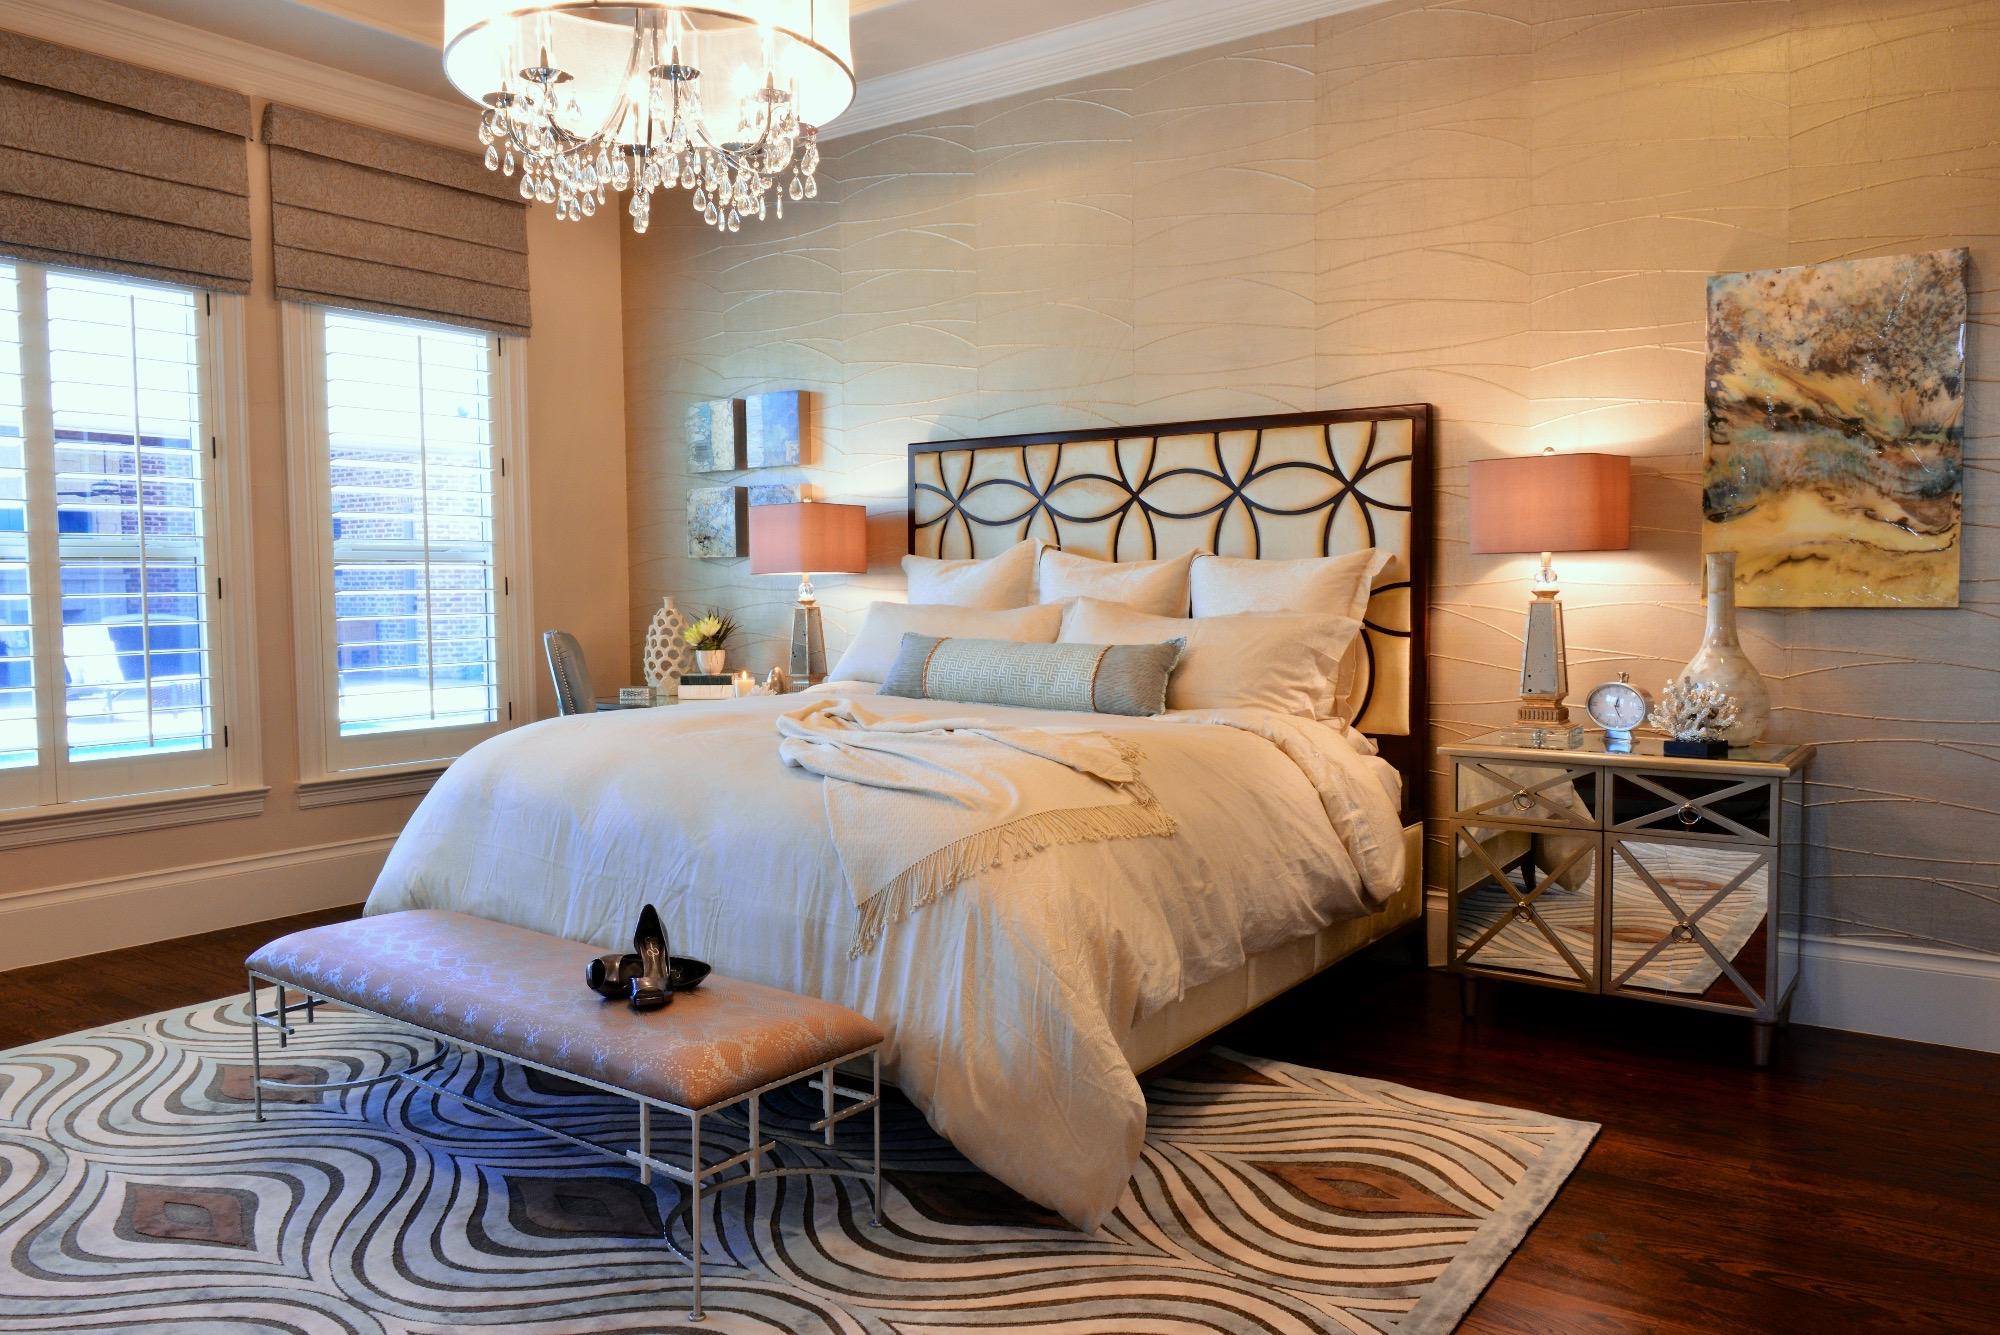 2017 Beautiful Master Bedroom Interior Design Ideas #15000